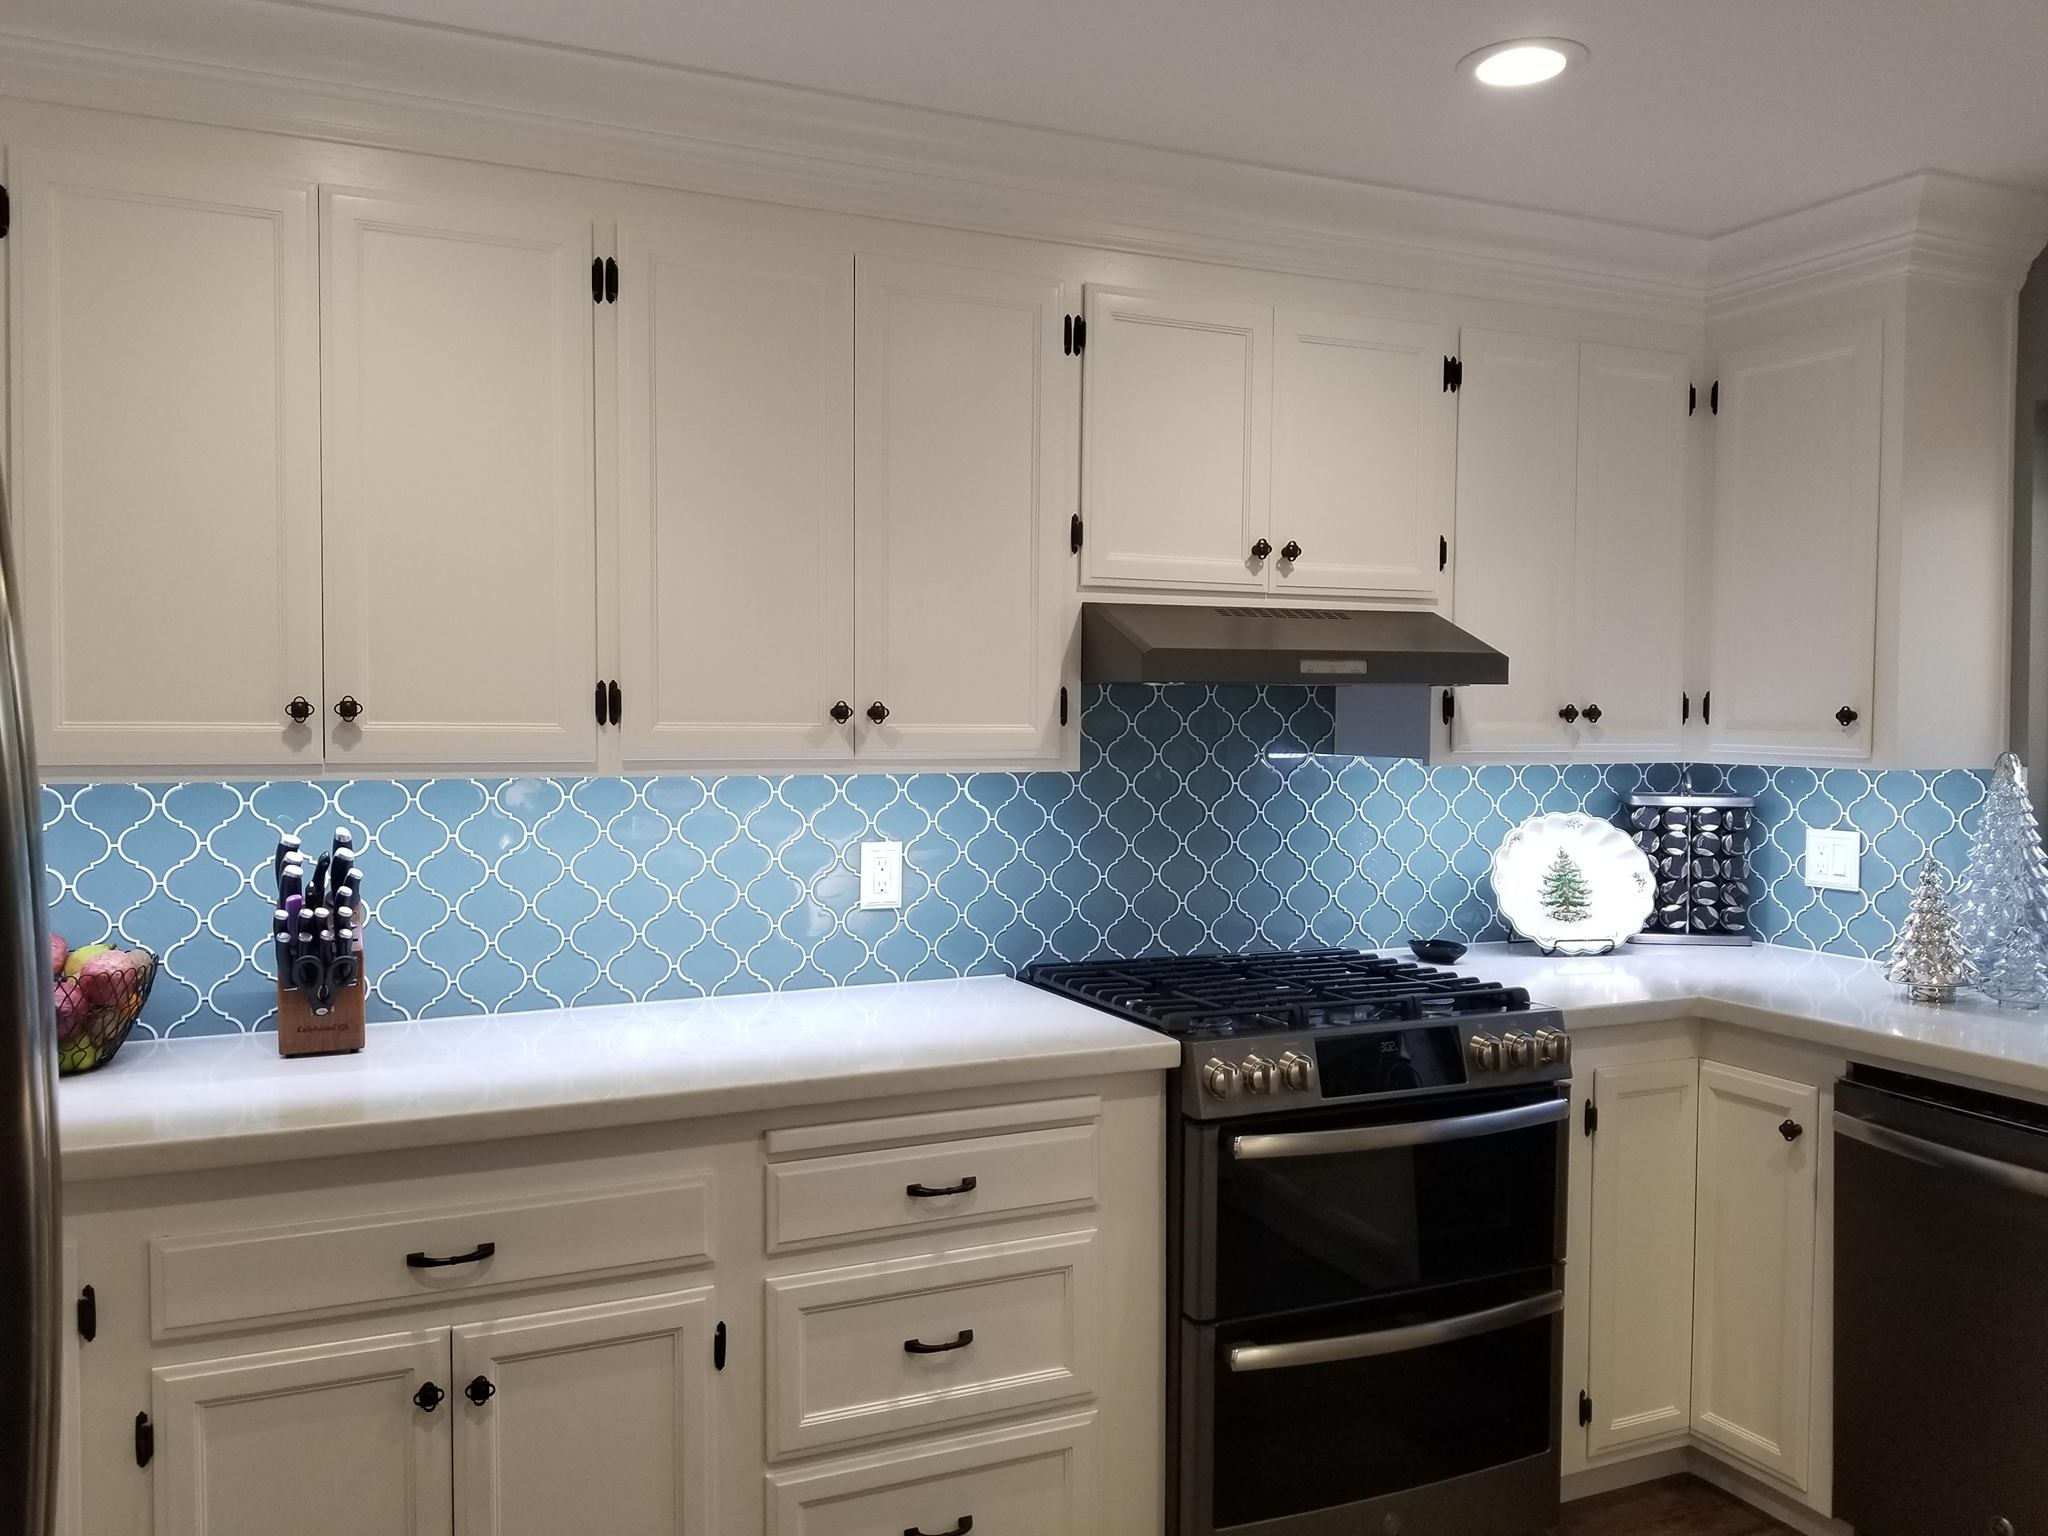 Kitchen Remodel Ripon - Brawley Construction Co